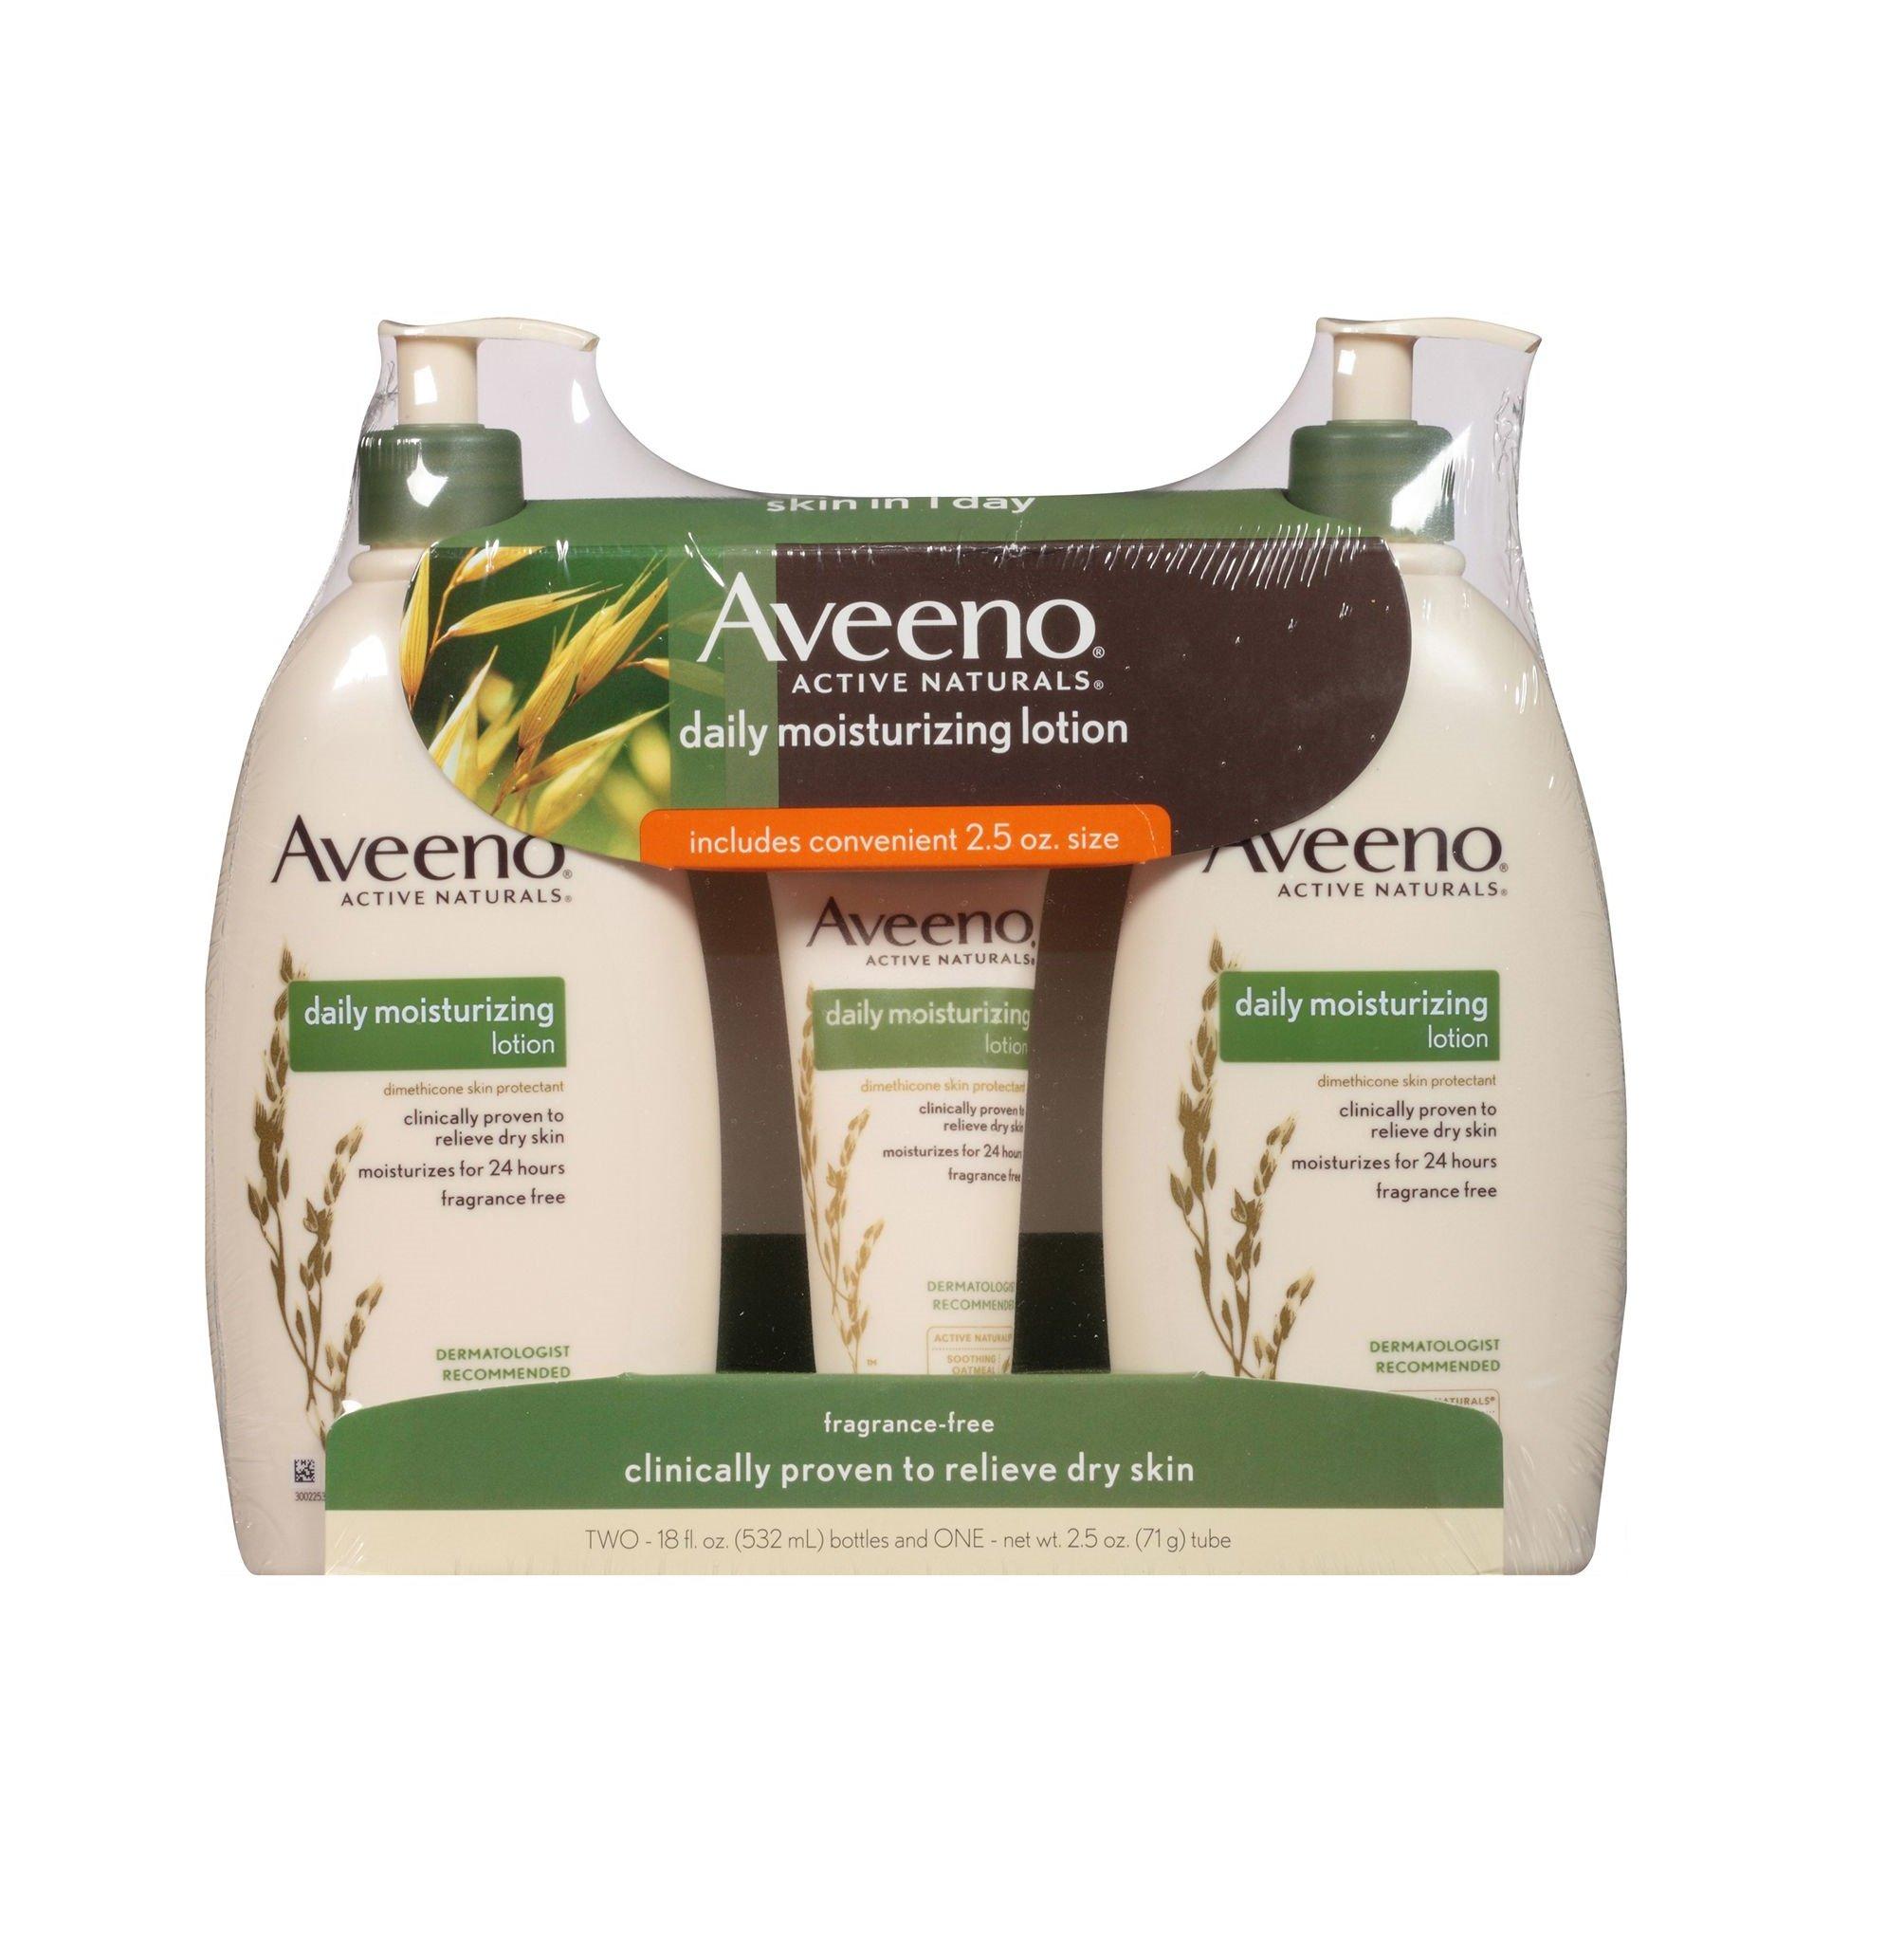 Aveeno Daily Moisturizing Lotion (18 fl. oz., 2 pk. with 2.5 oz. Tube) by Aveeno